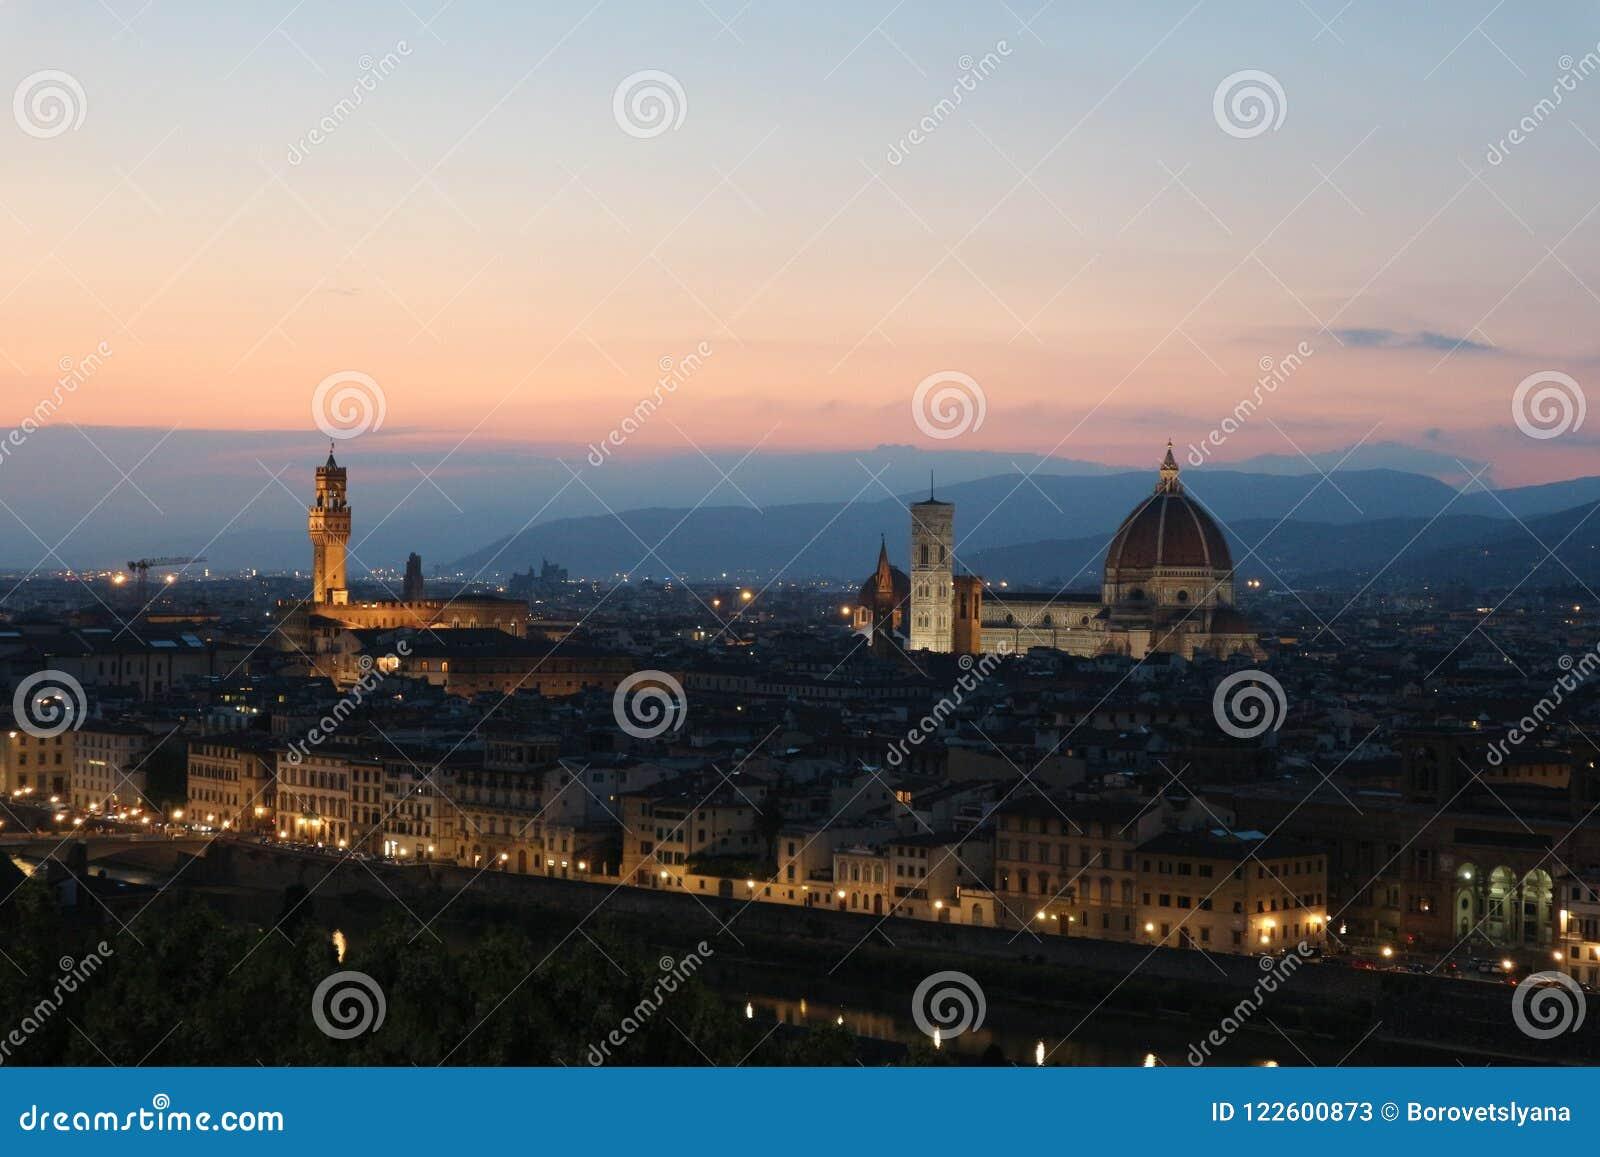 firenze florence for Ð traveler the best night landscape stock